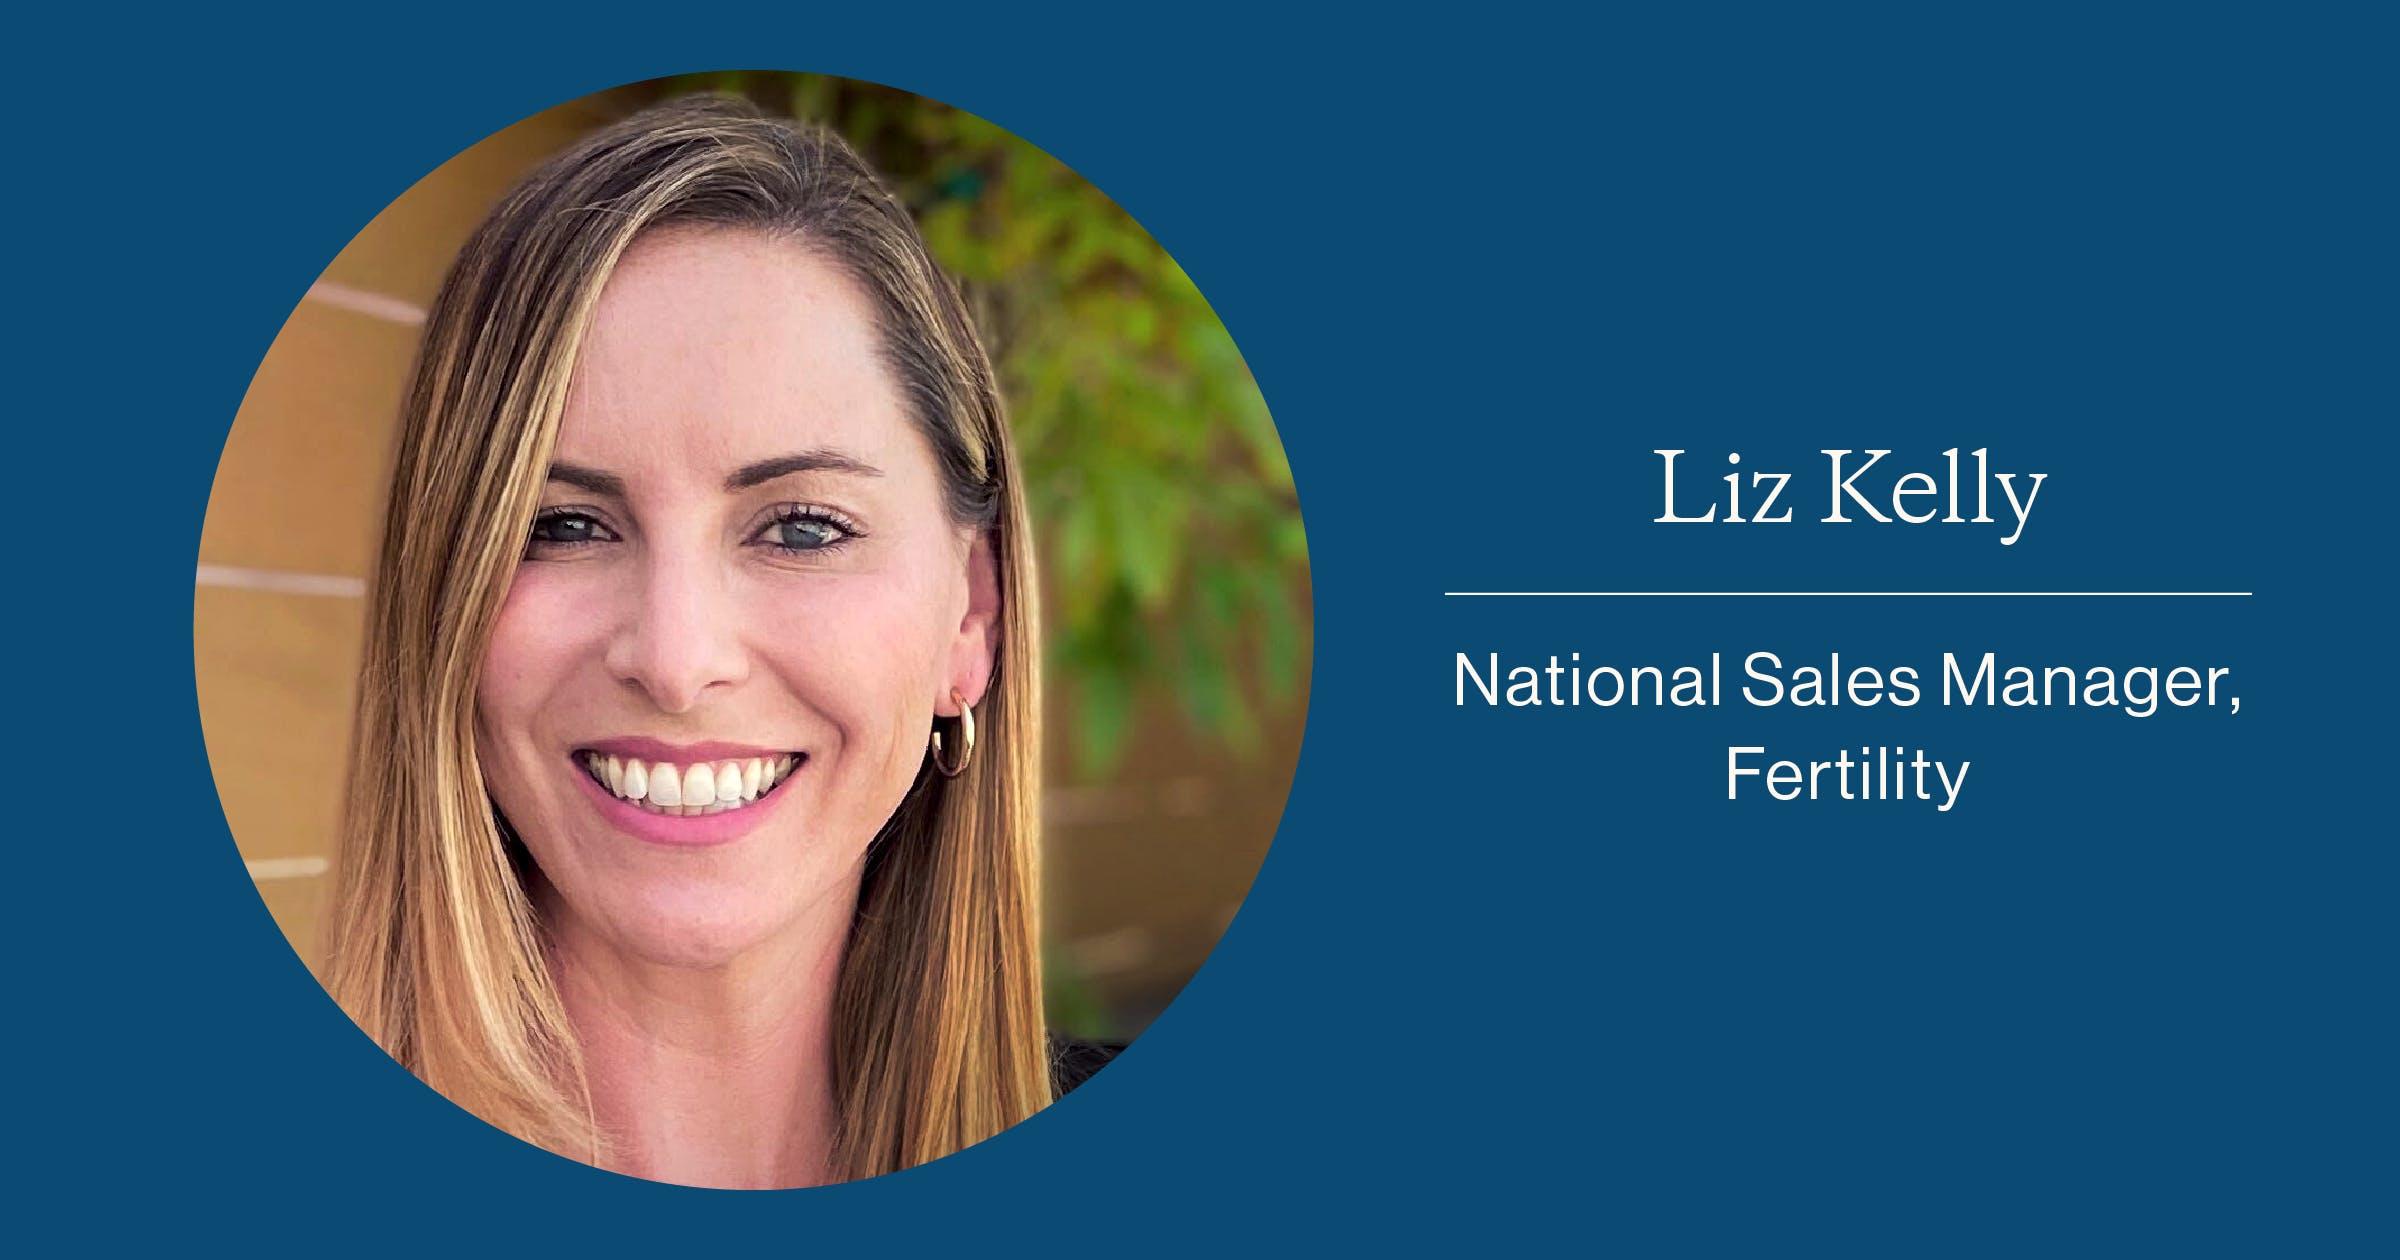 Liz Kelly, National Sales Manager, Fertility